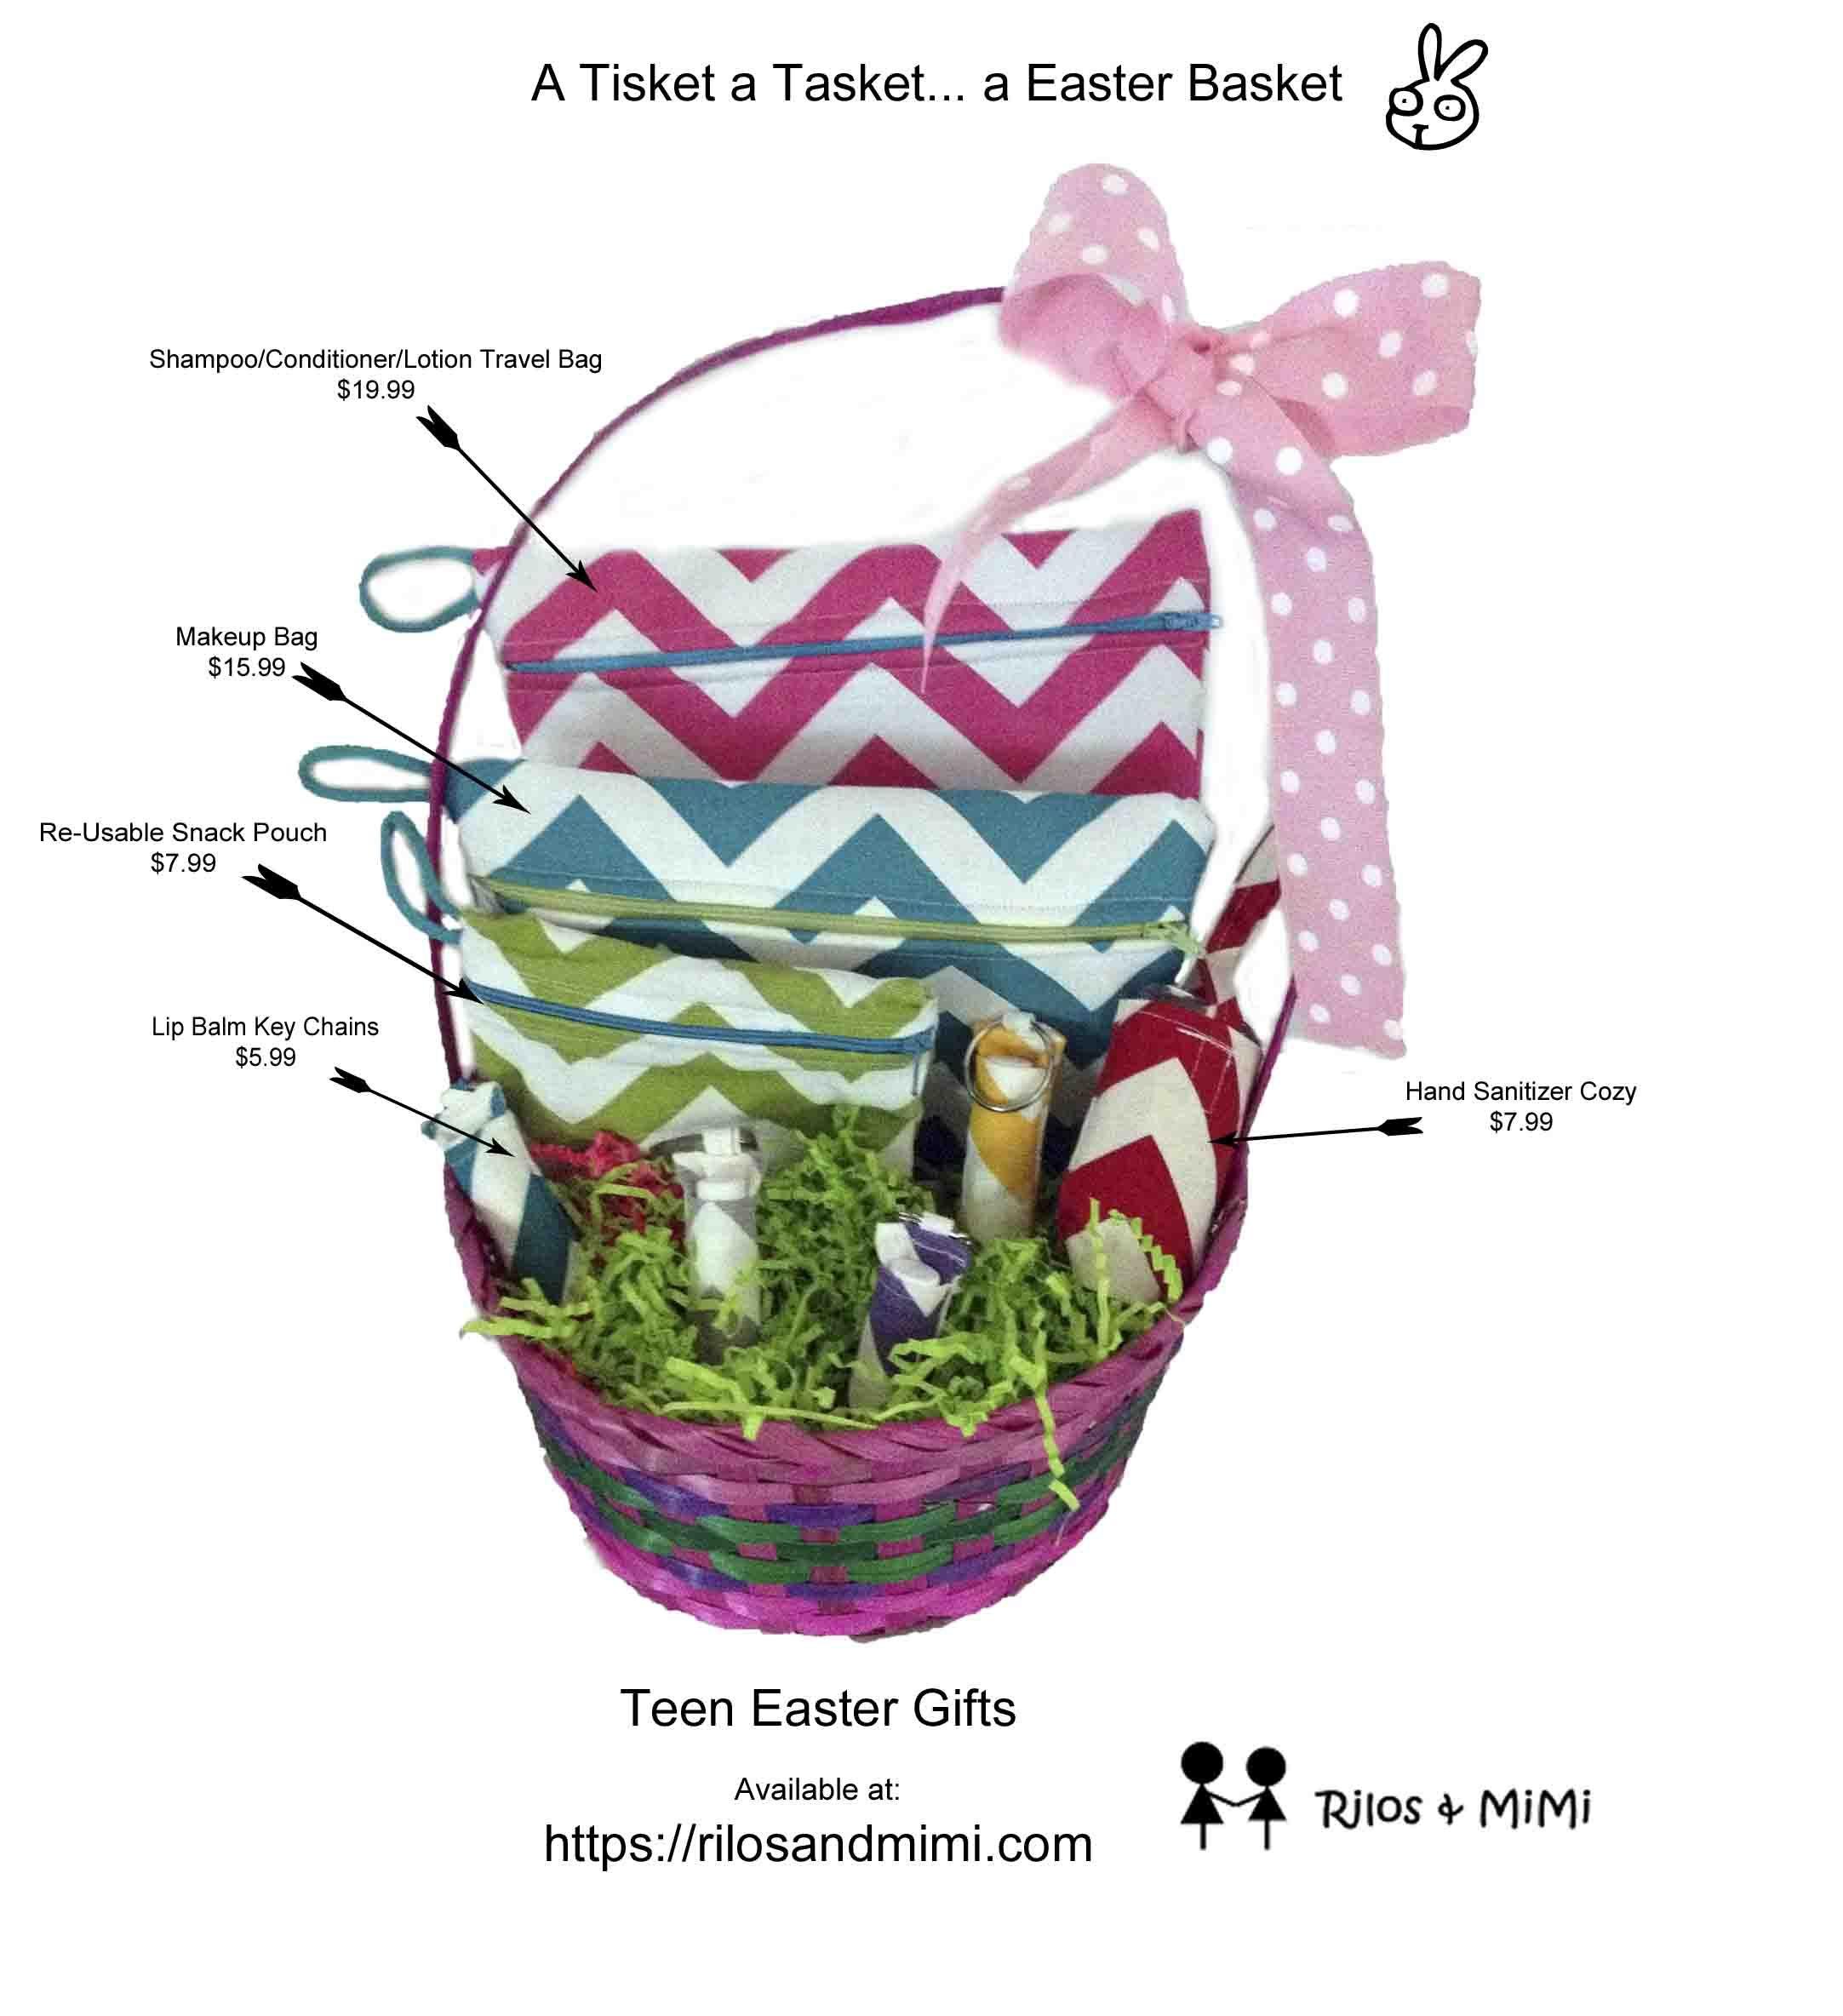 Pin By Angela Cardinal On Easter 0o0o Easter Baskets Hand